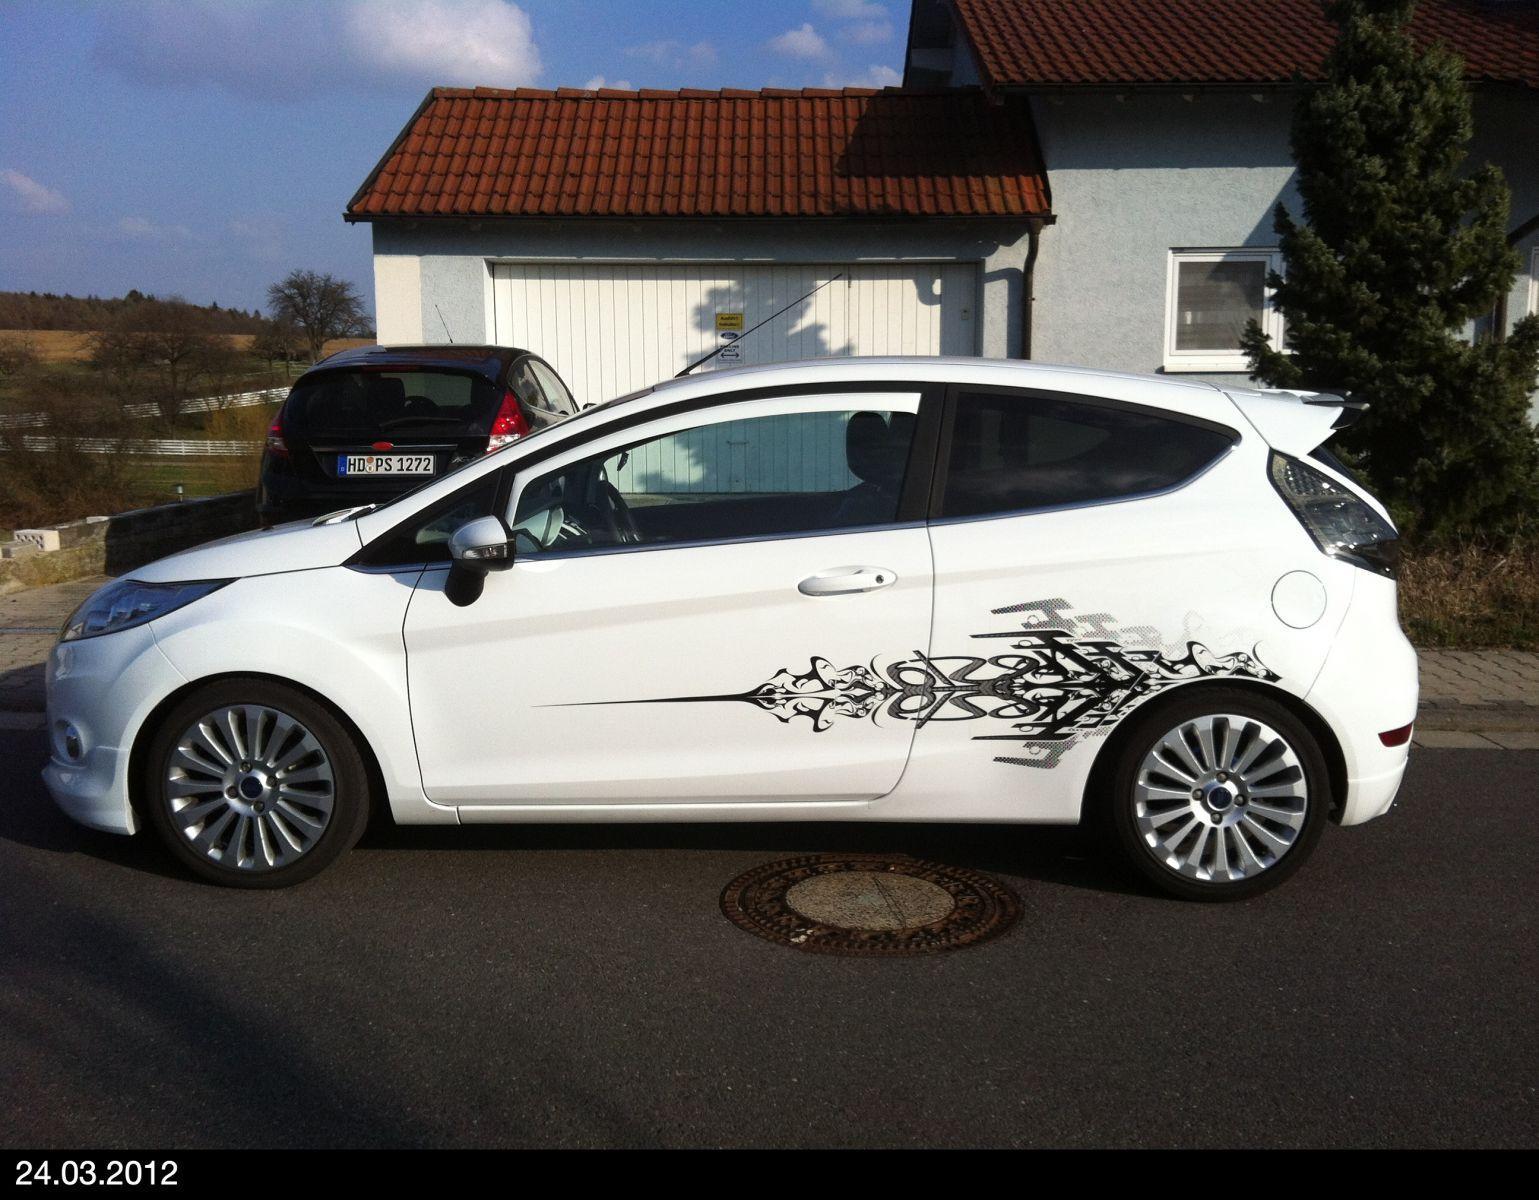 My Ford Fiesta MK7